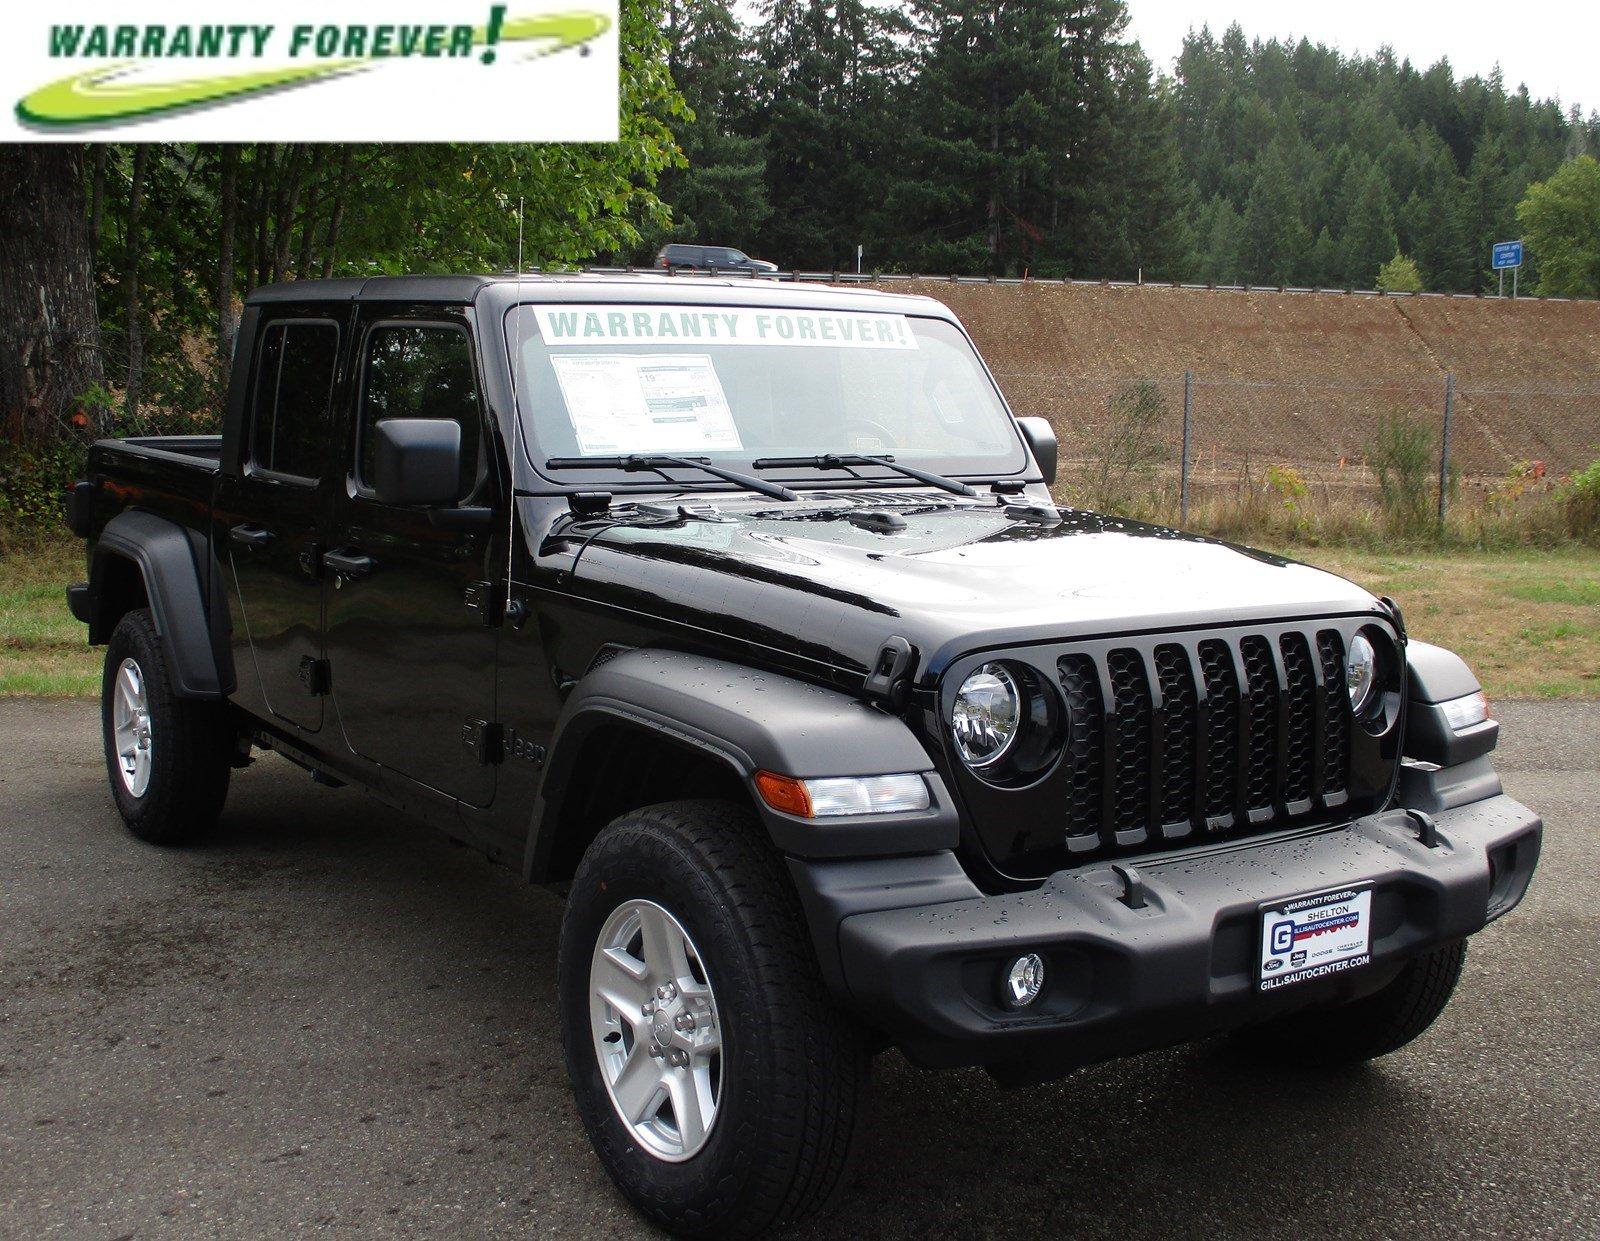 New-2020-Jeep-Gladiator-Sport-S-4x4